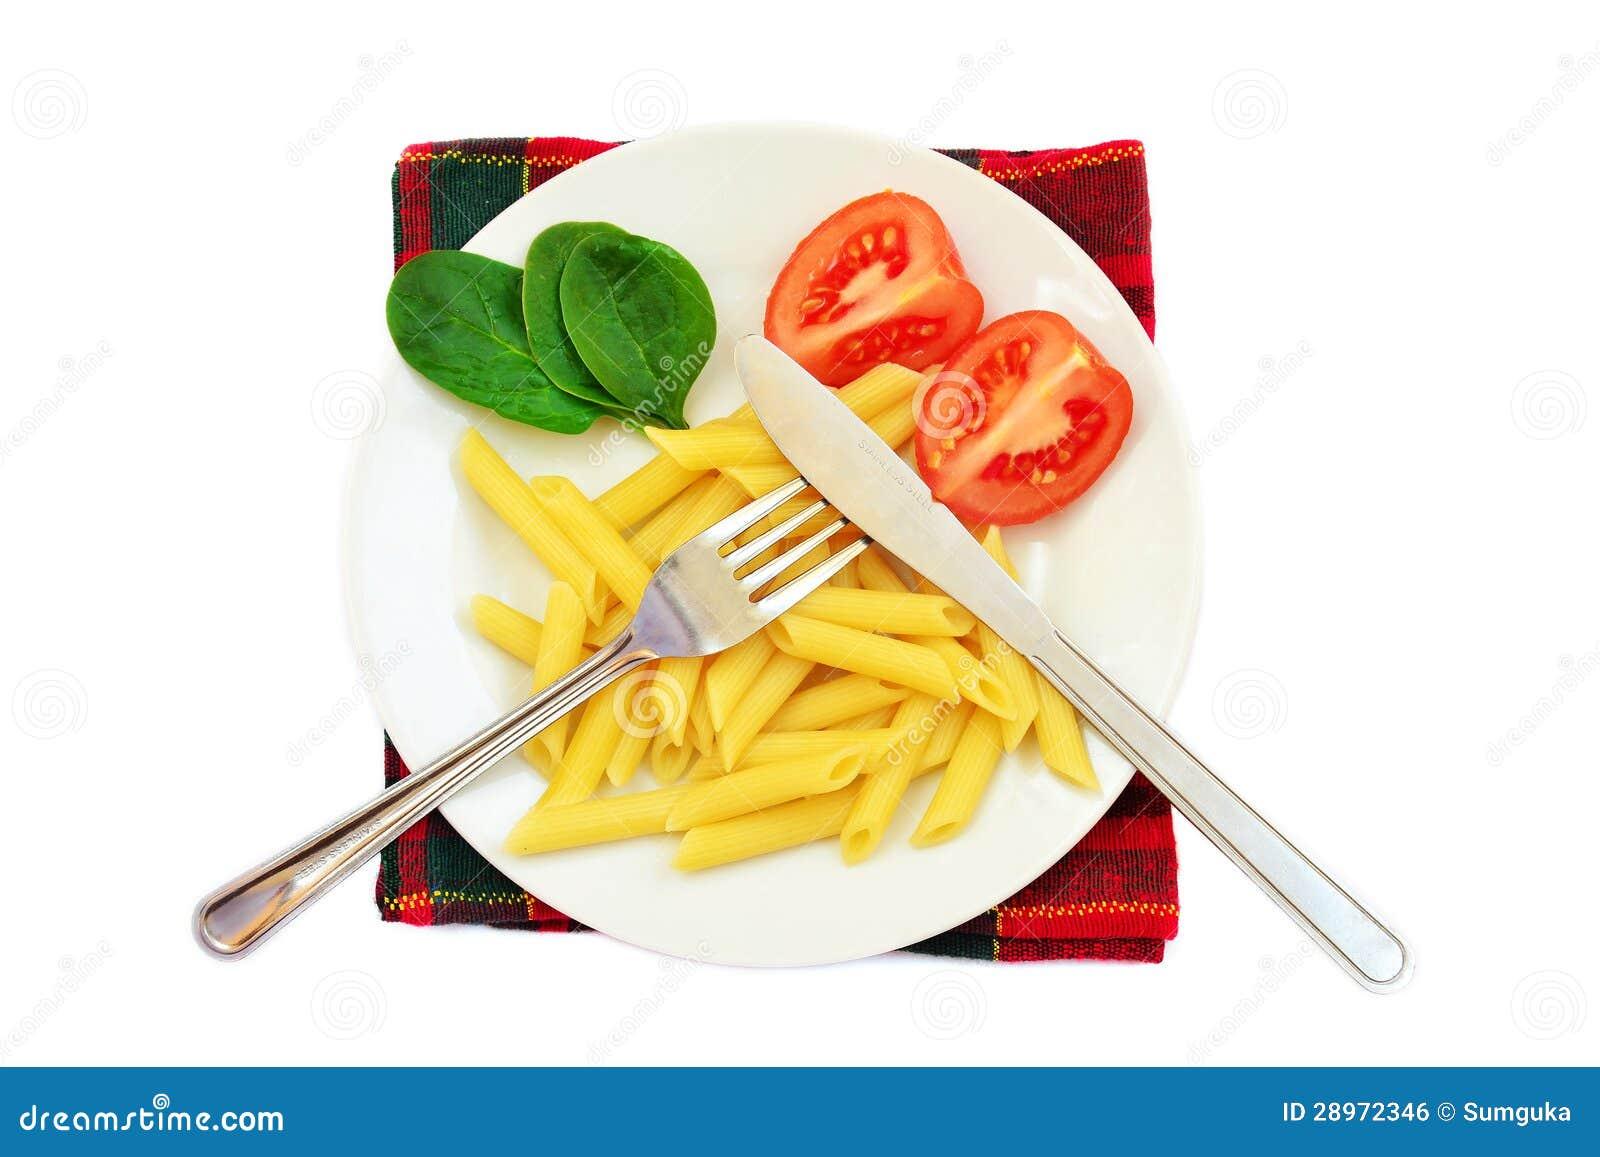 Makaron, pomidory i szpinak na talerzu,